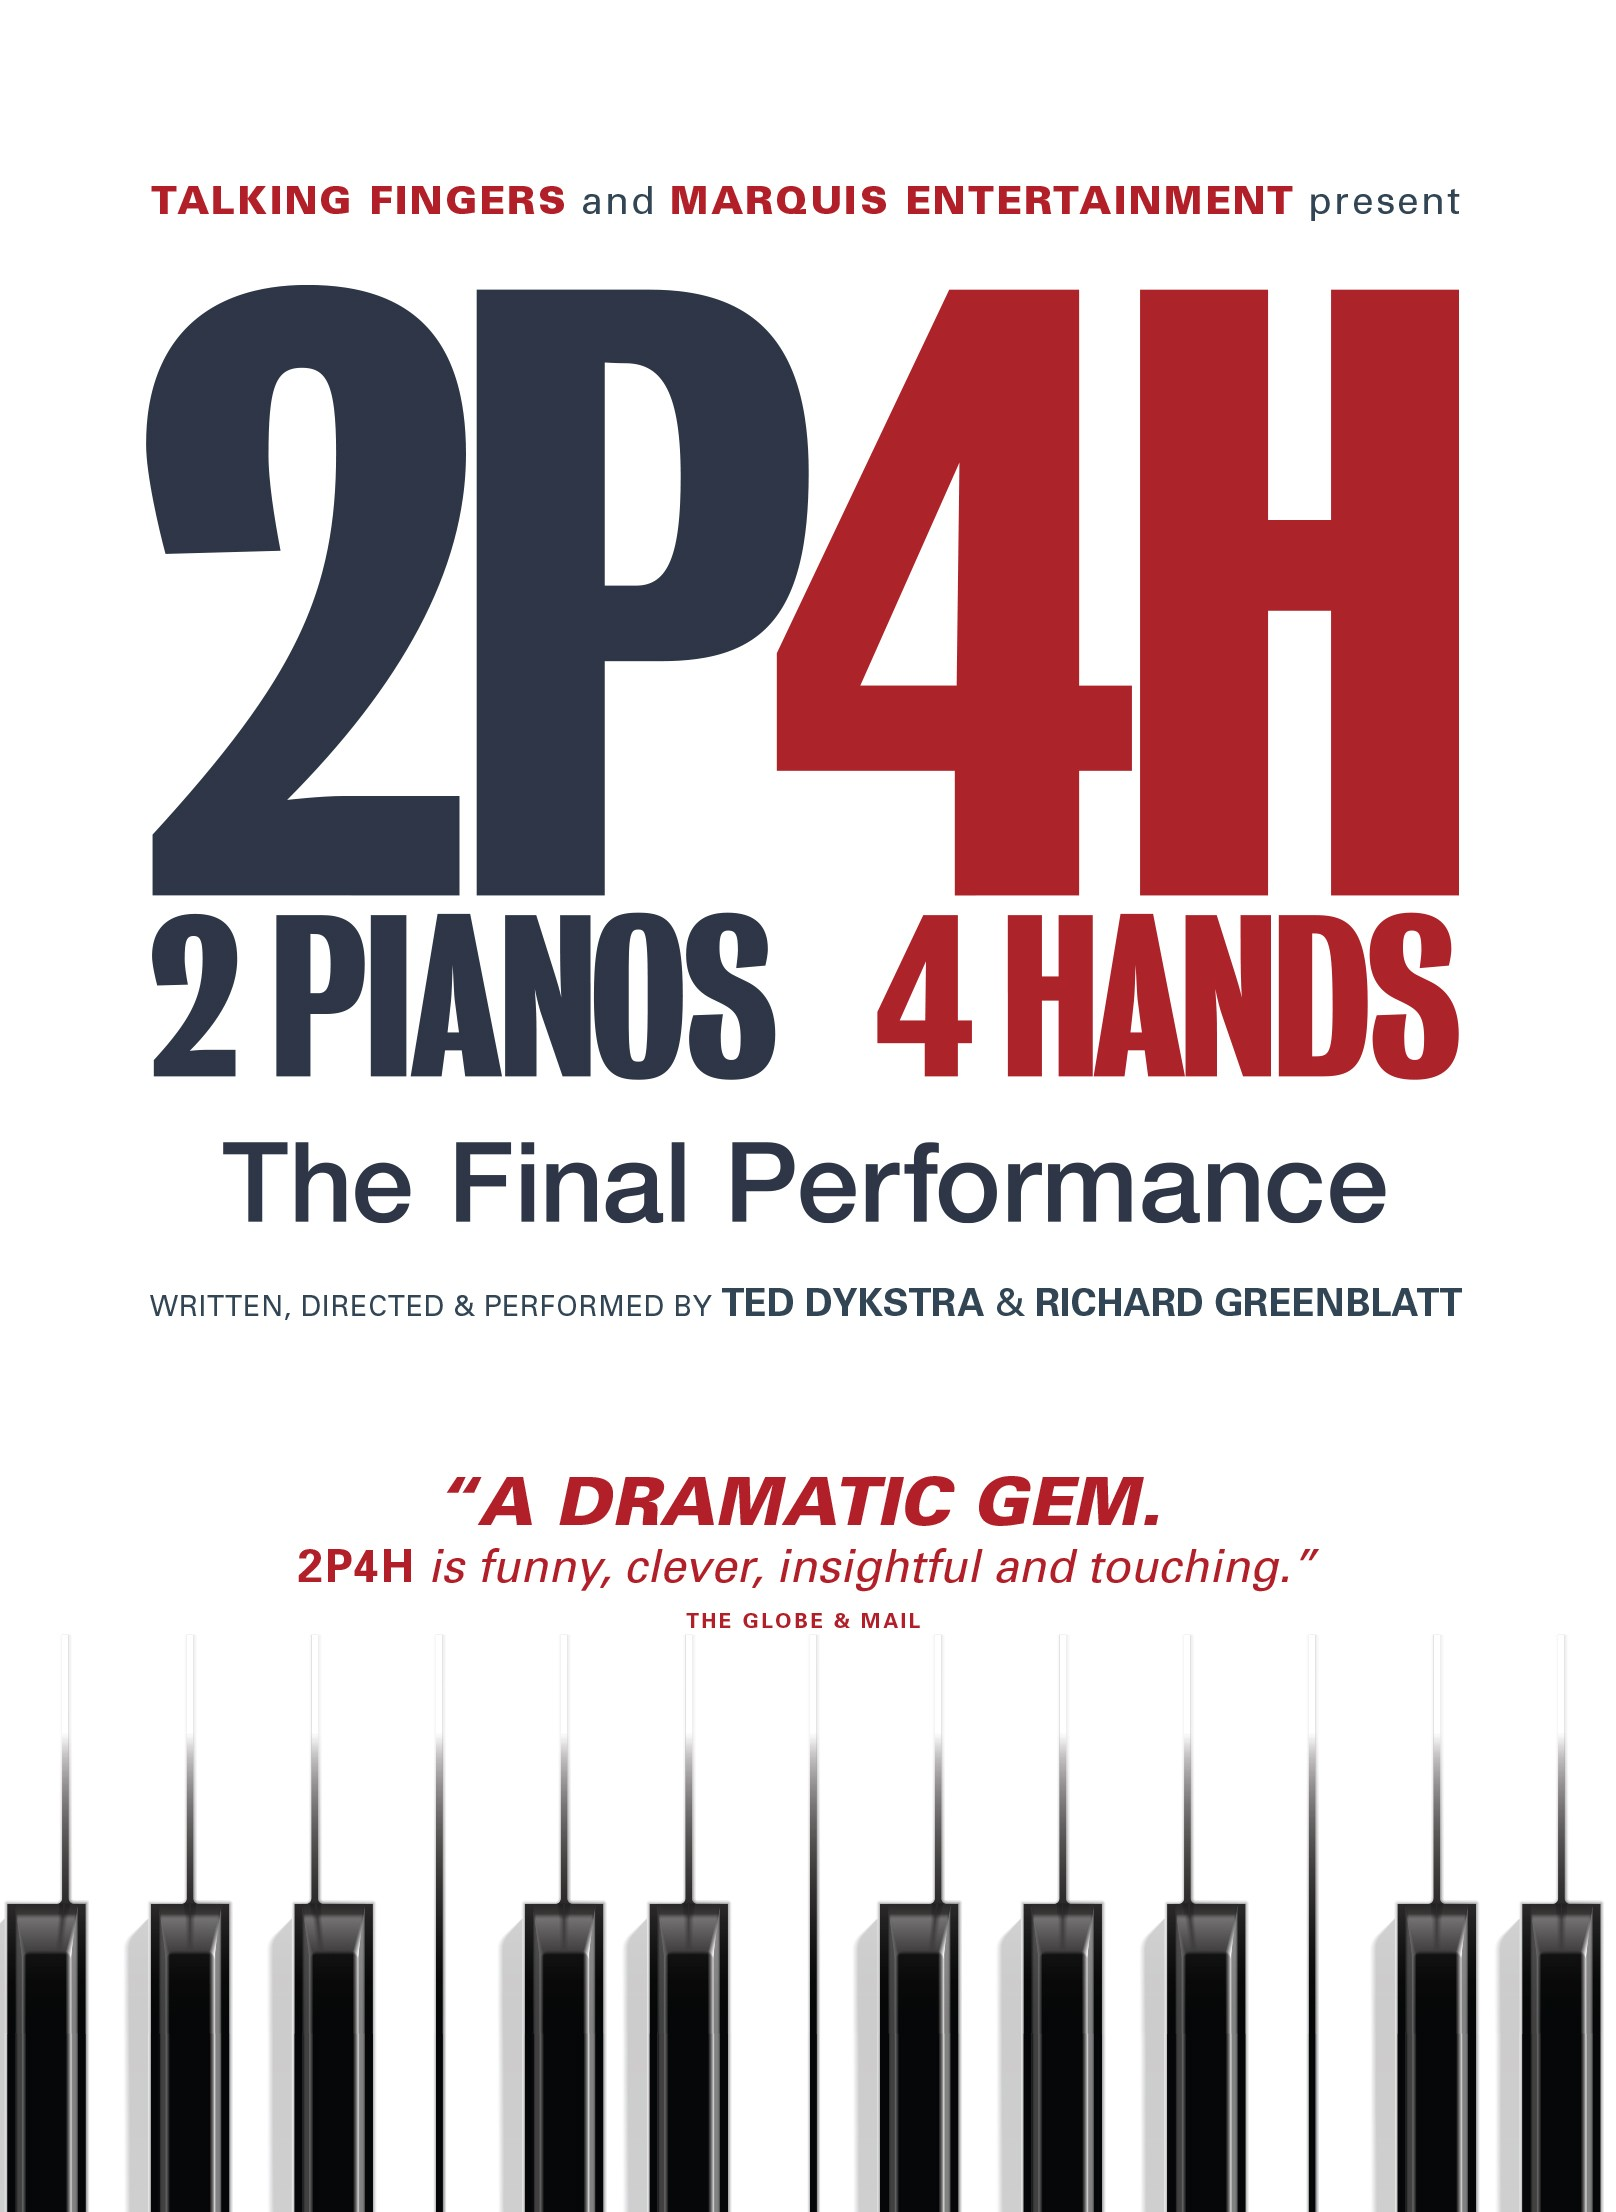 2 Pianos 4 Hands DVD + Book Bundle